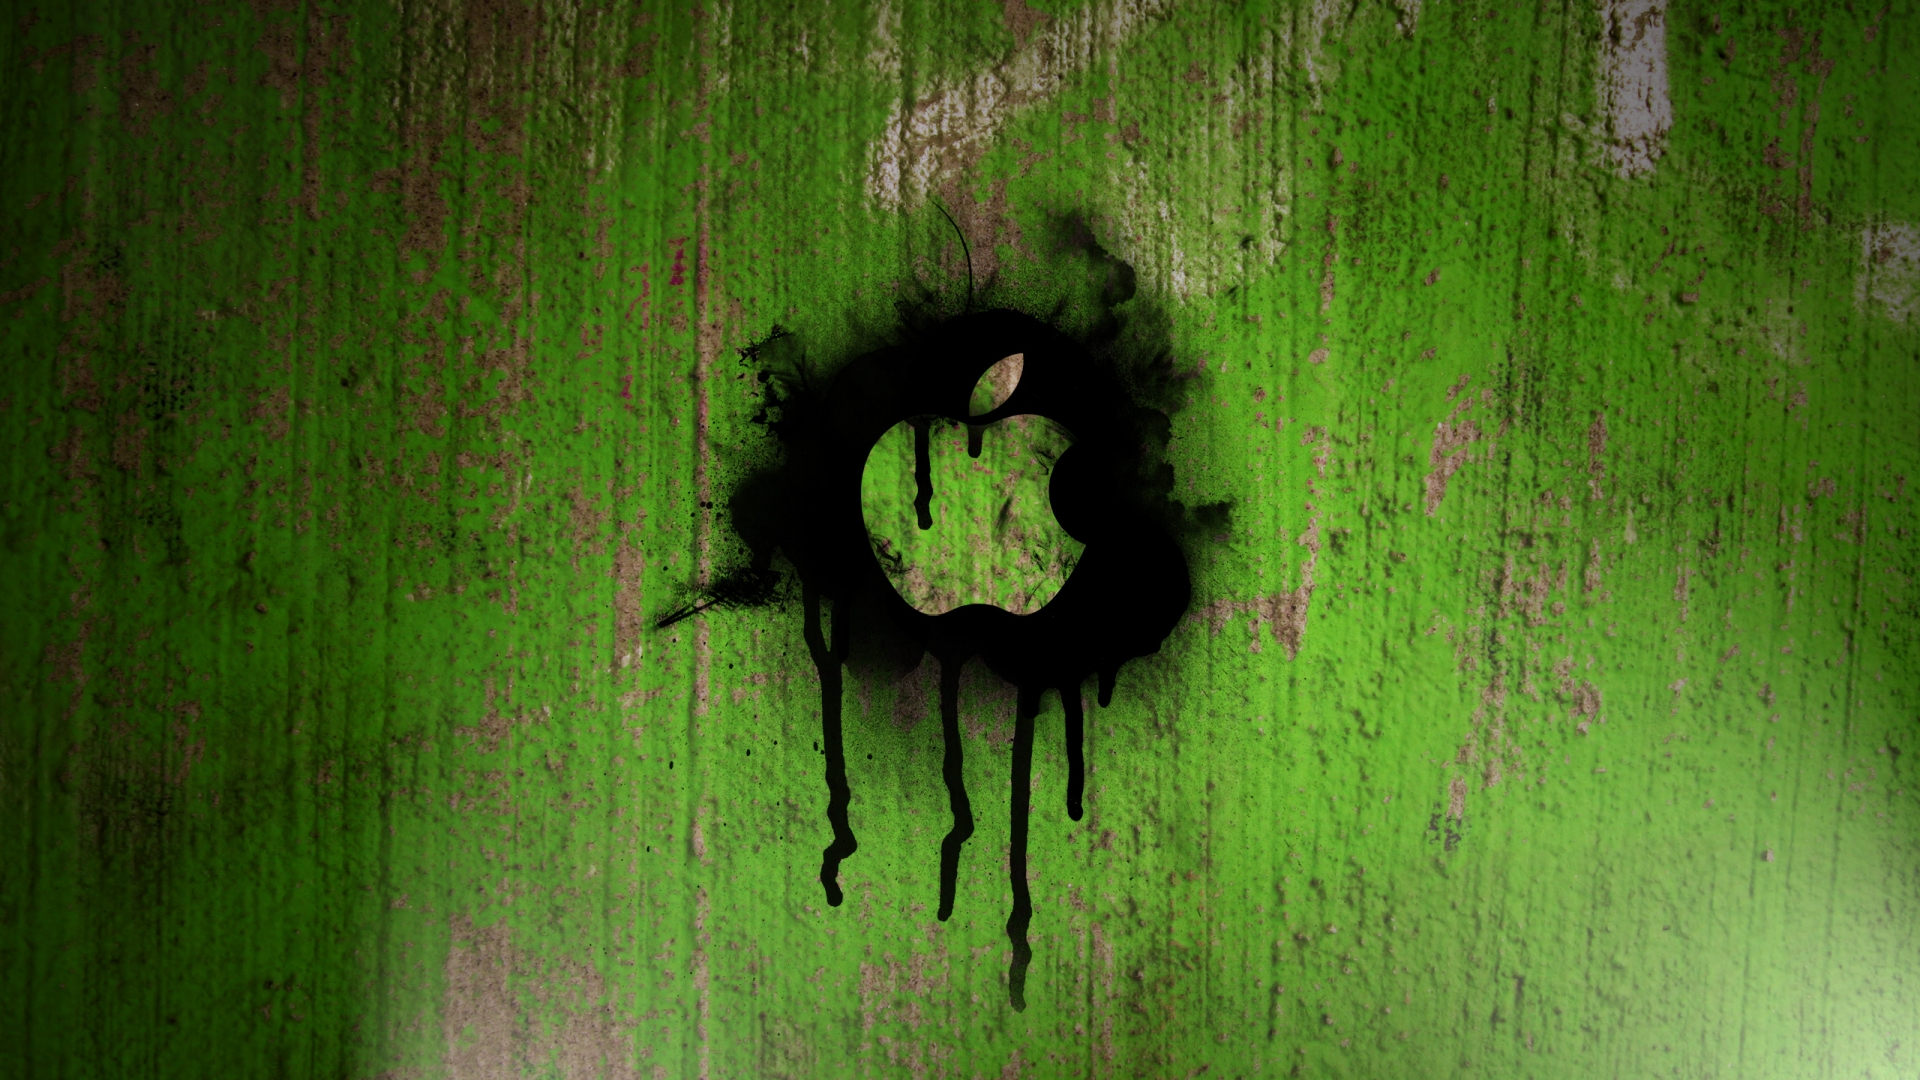 Apple-Spray-Paint-Wallpaper